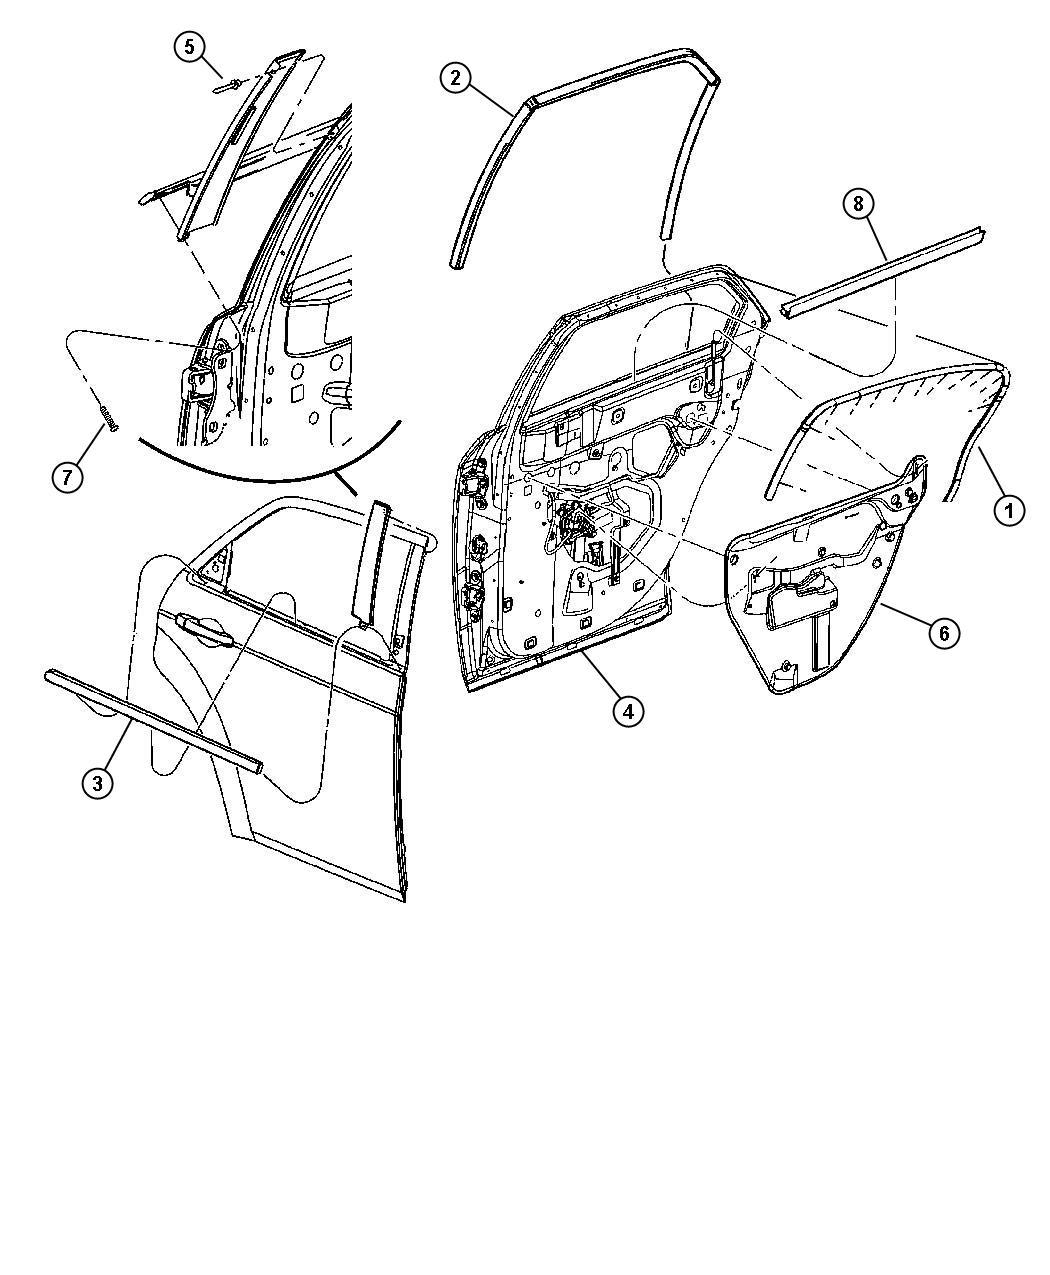 2007 Dodge Magnum R/T 5.7L Hemi V8 Weatherstrip. Rear door